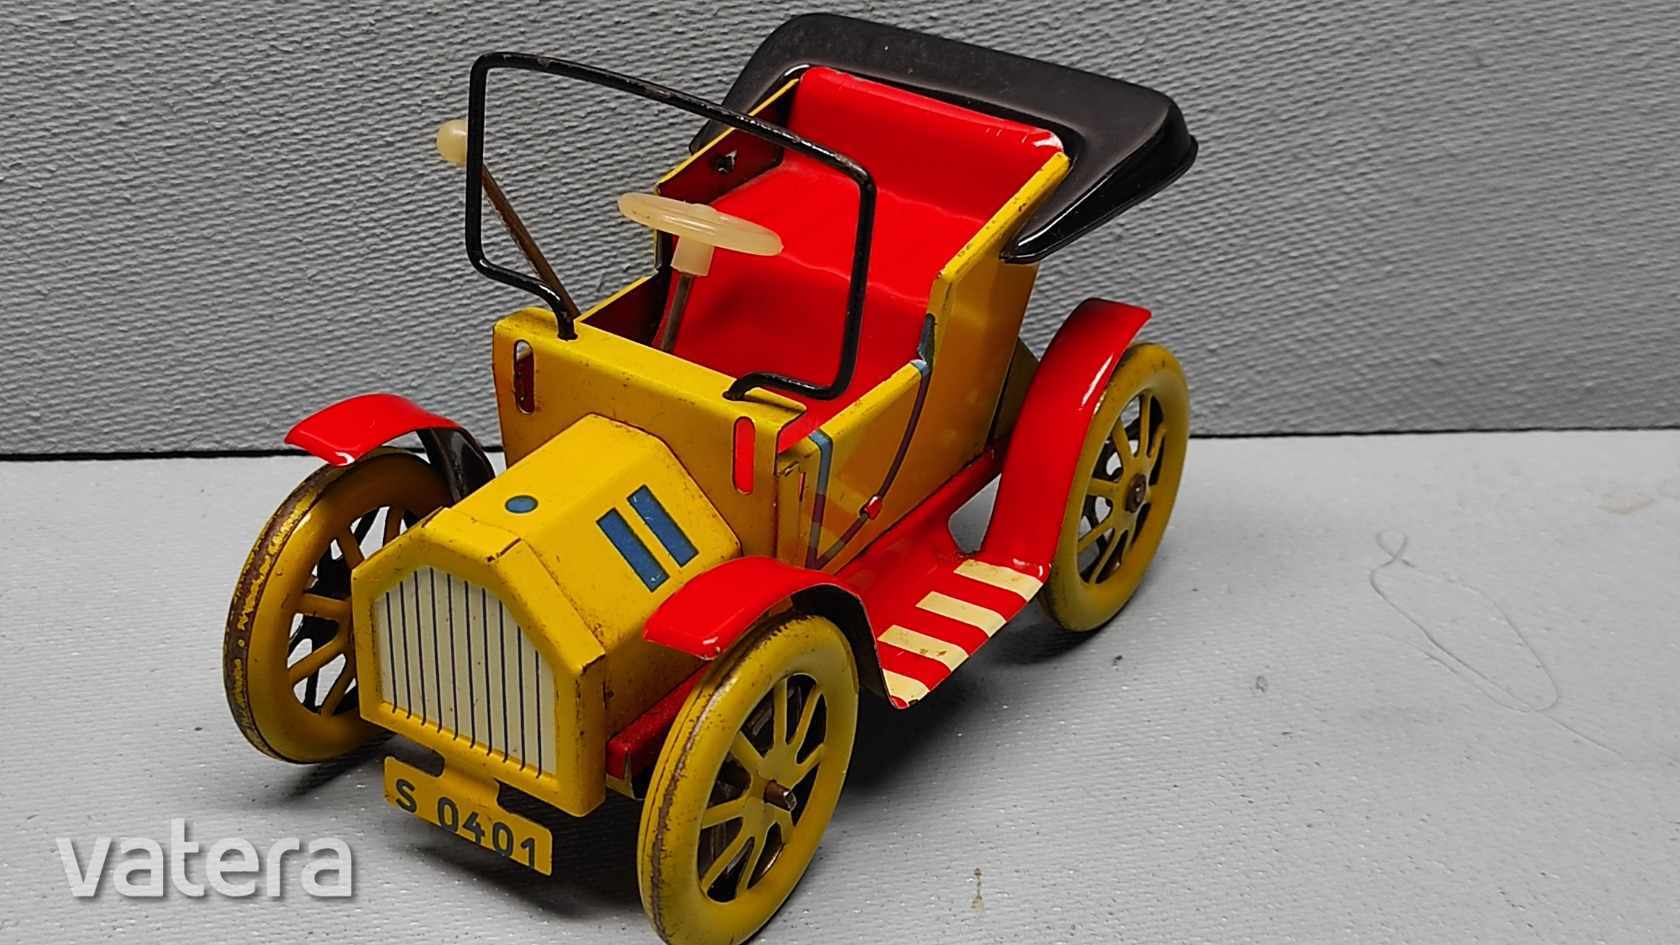 klasszikus-csehszlovak-ford-t-modell-oramuves-auto-3b5b_1_big.jpg